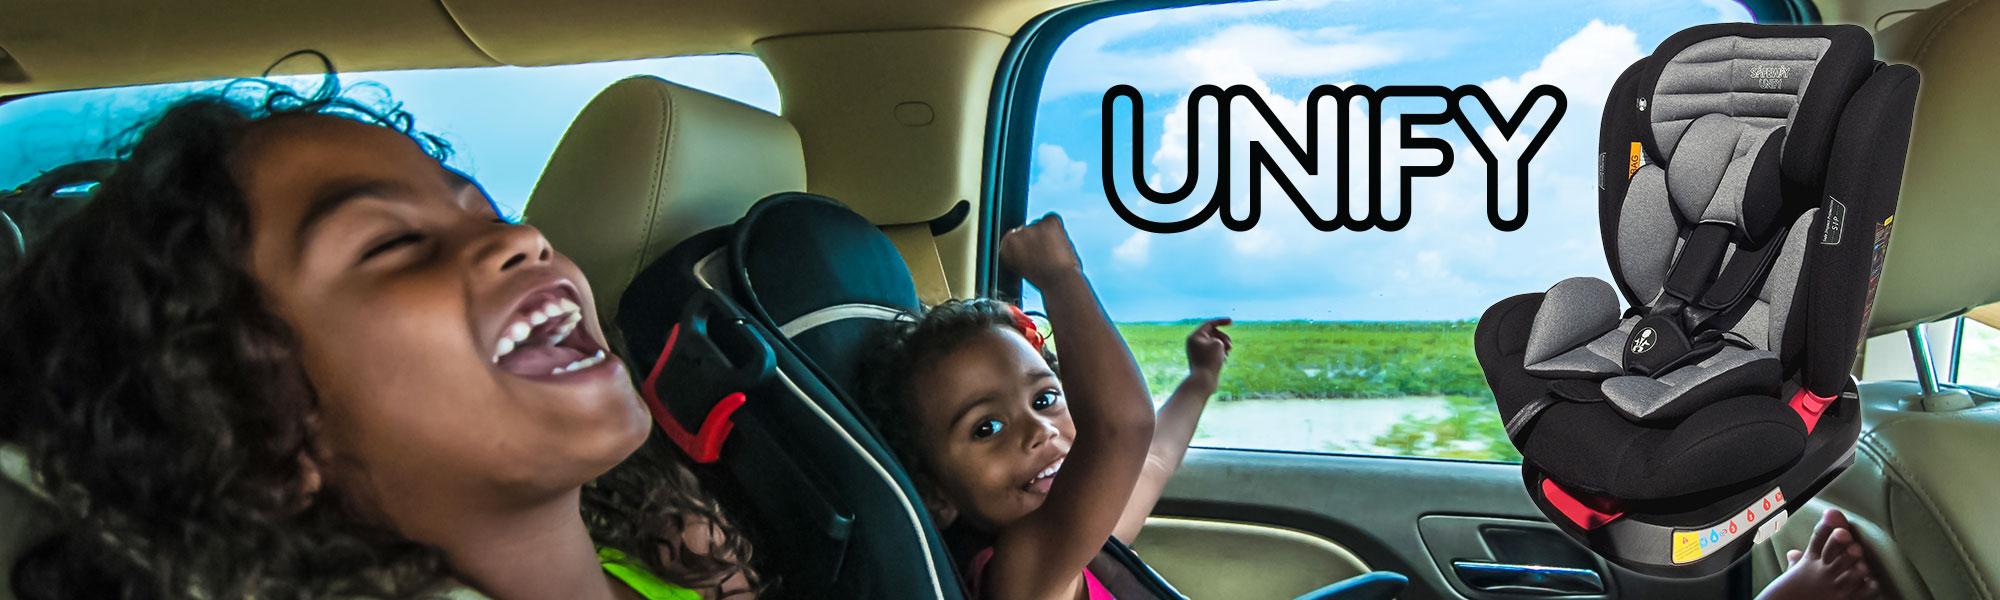 Unify-2000x600-V2